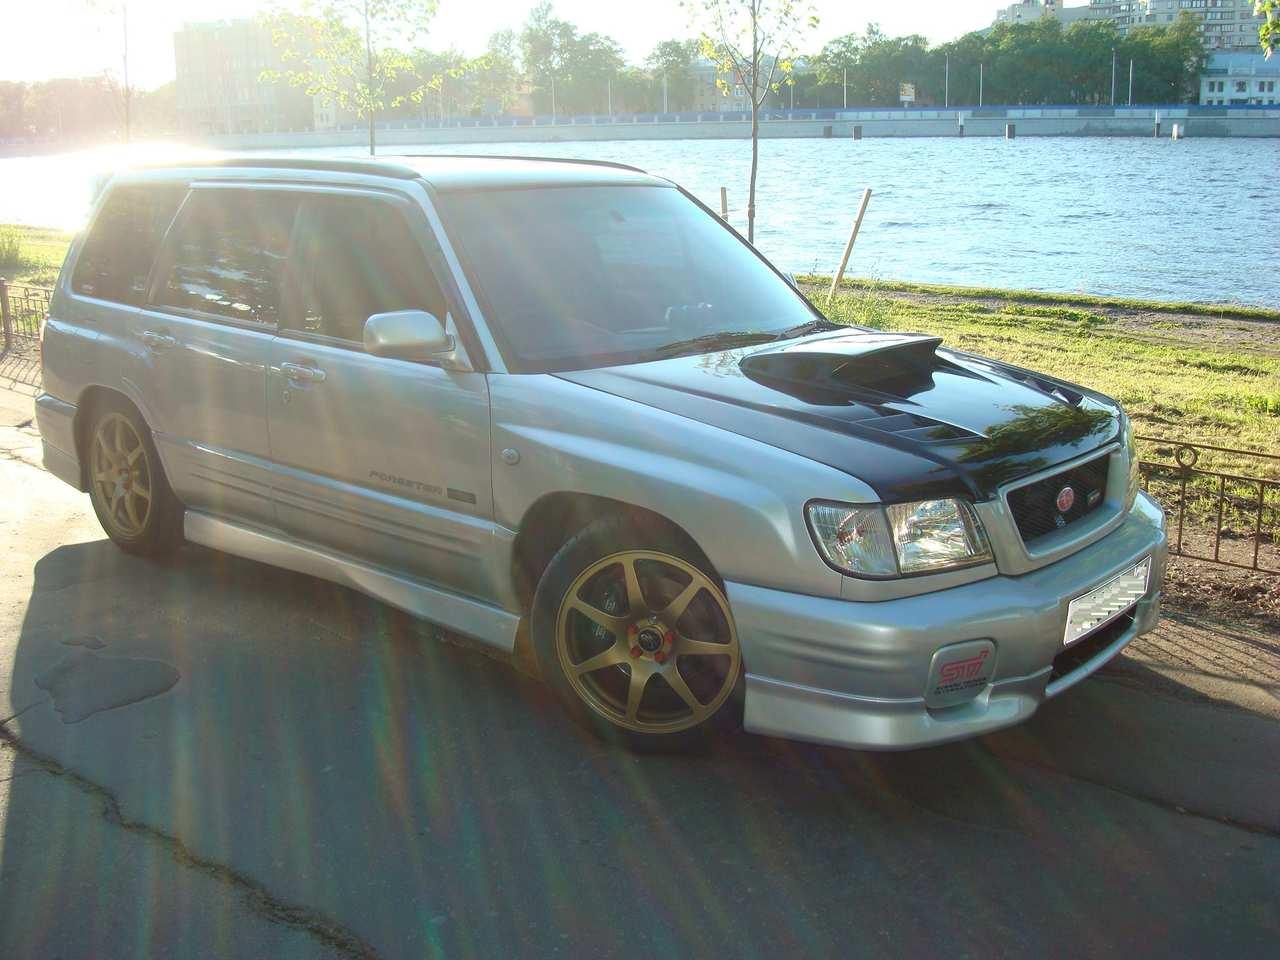 2001 subaru impreza wrx sti specs engine size 2 5 fuel type gasoline transmission gearbox manual car directory